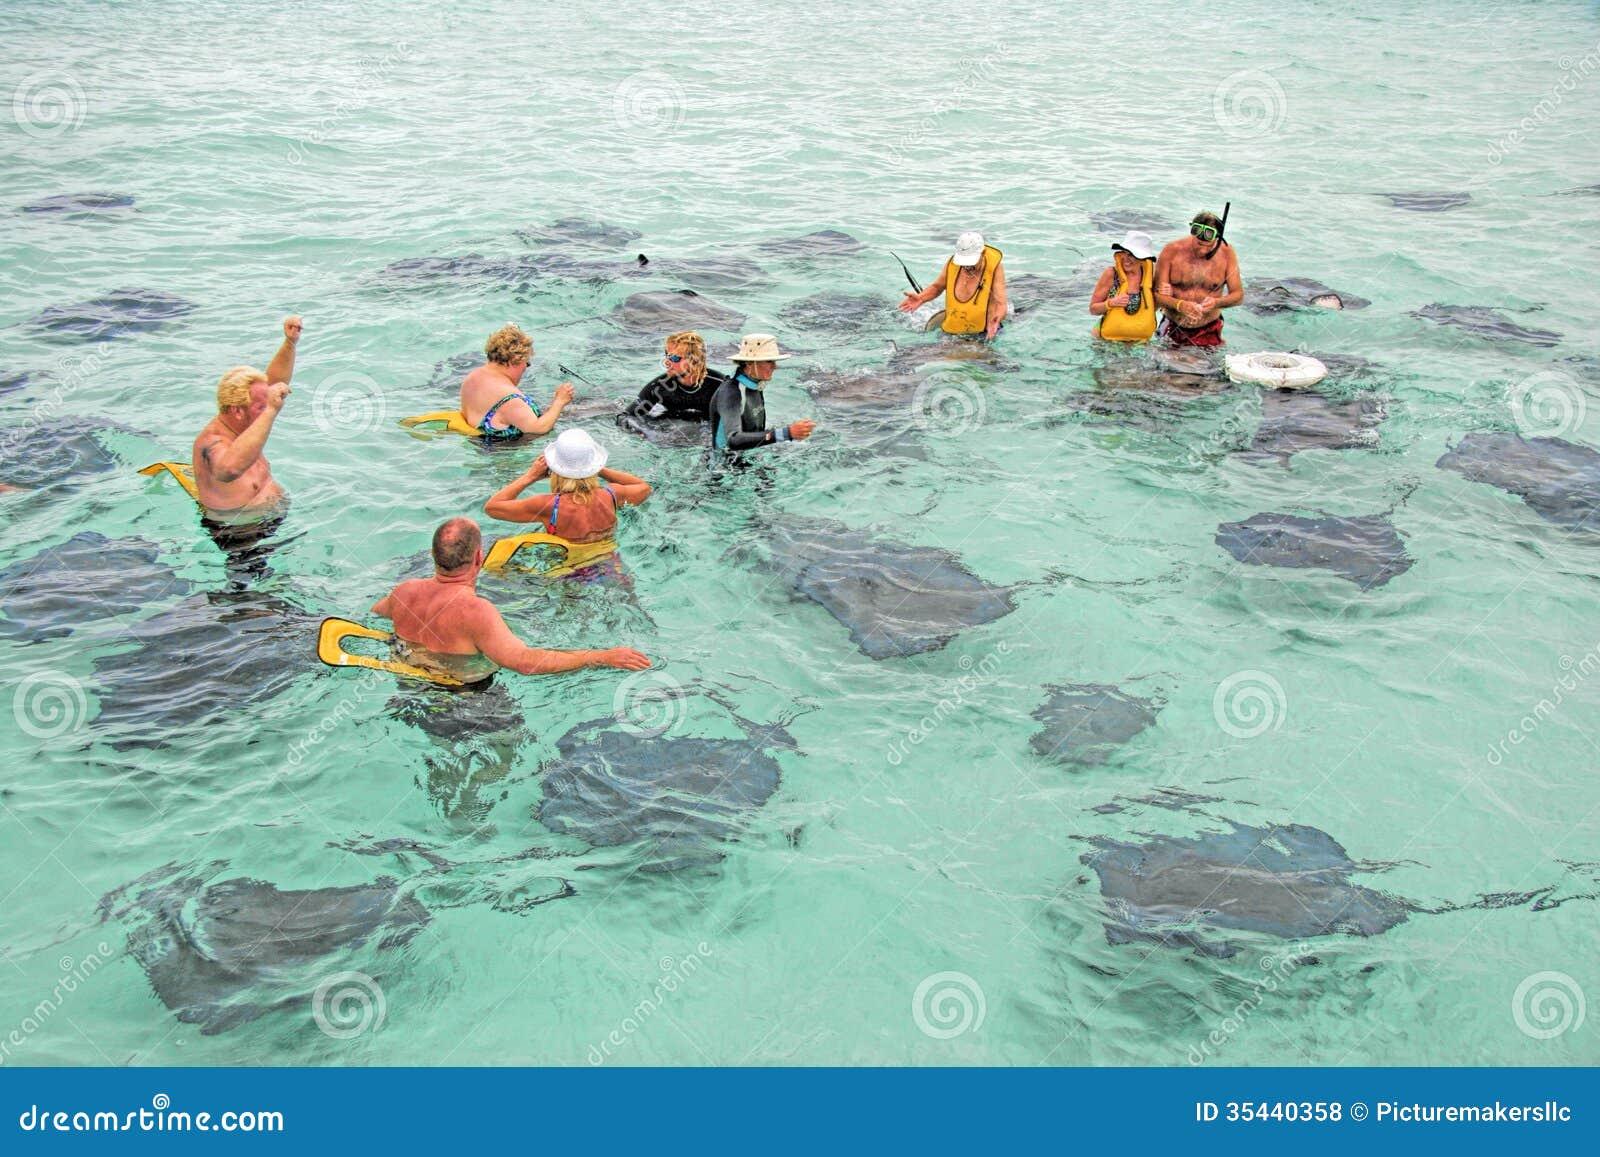 Stingray City , Grand Caymans Island .Tourist feed the Stingray fish.